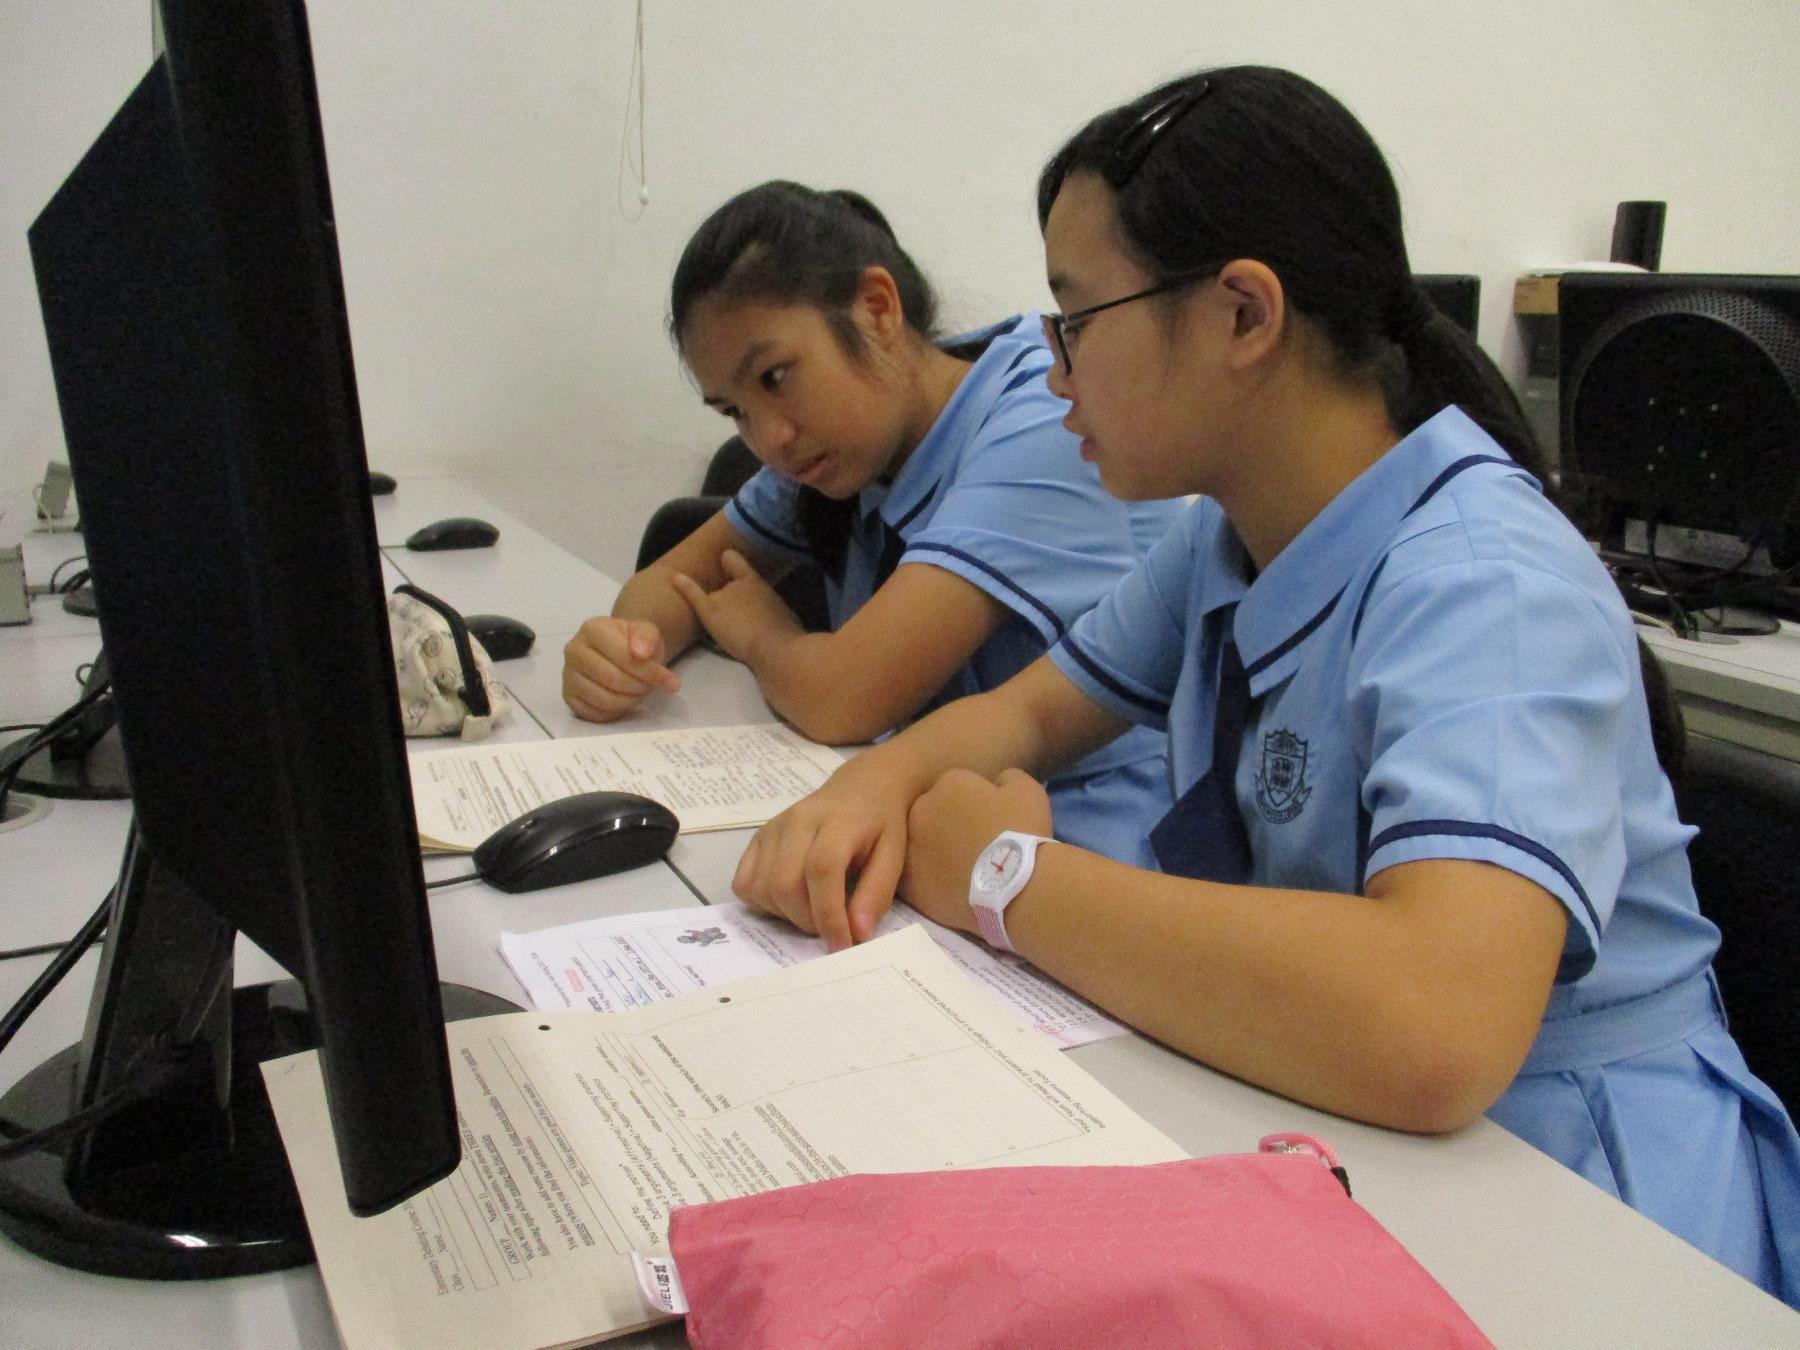 http://www.npc.edu.hk/sites/default/files/img_0148.jpg